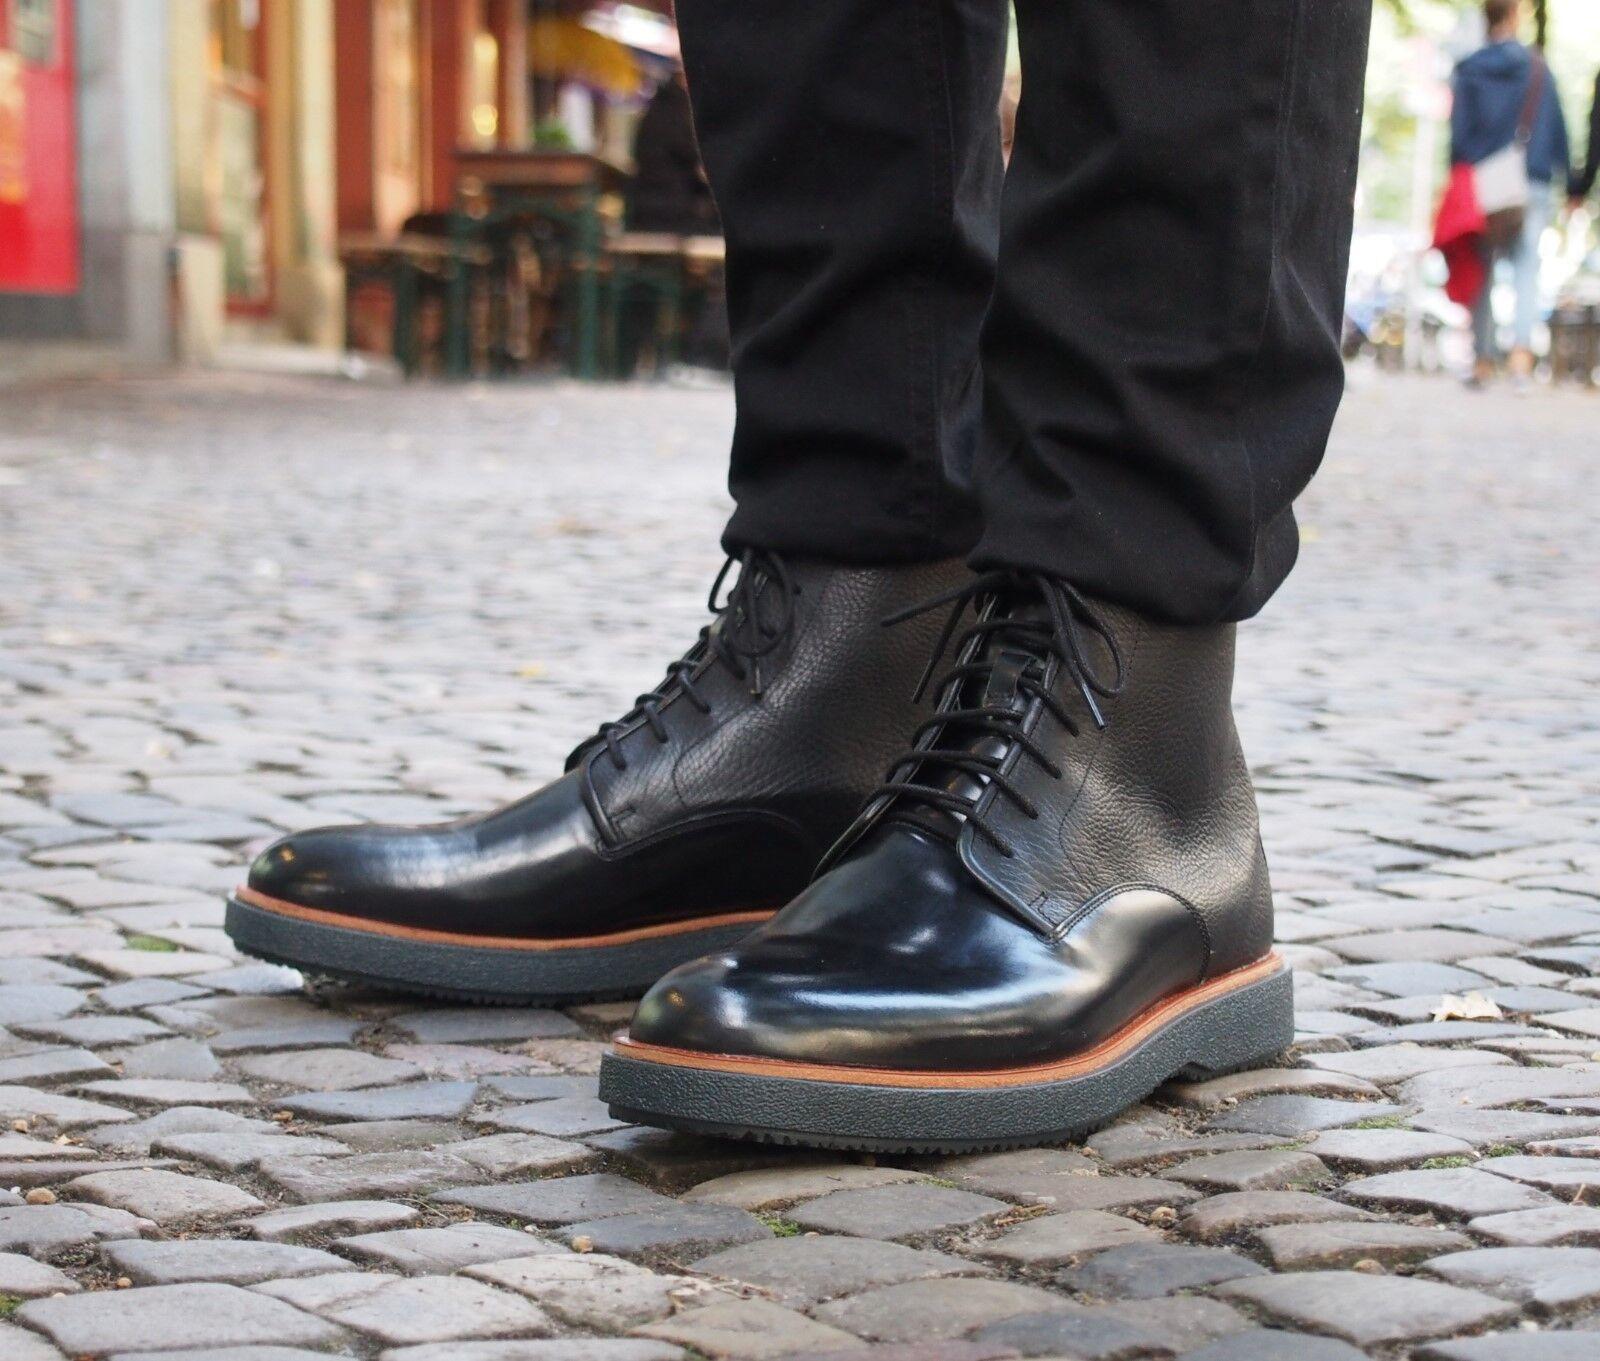 Clarks Originals Schuh Modur Hi Black Echtleder Herrenschuh Schnürschuh Neu SALE